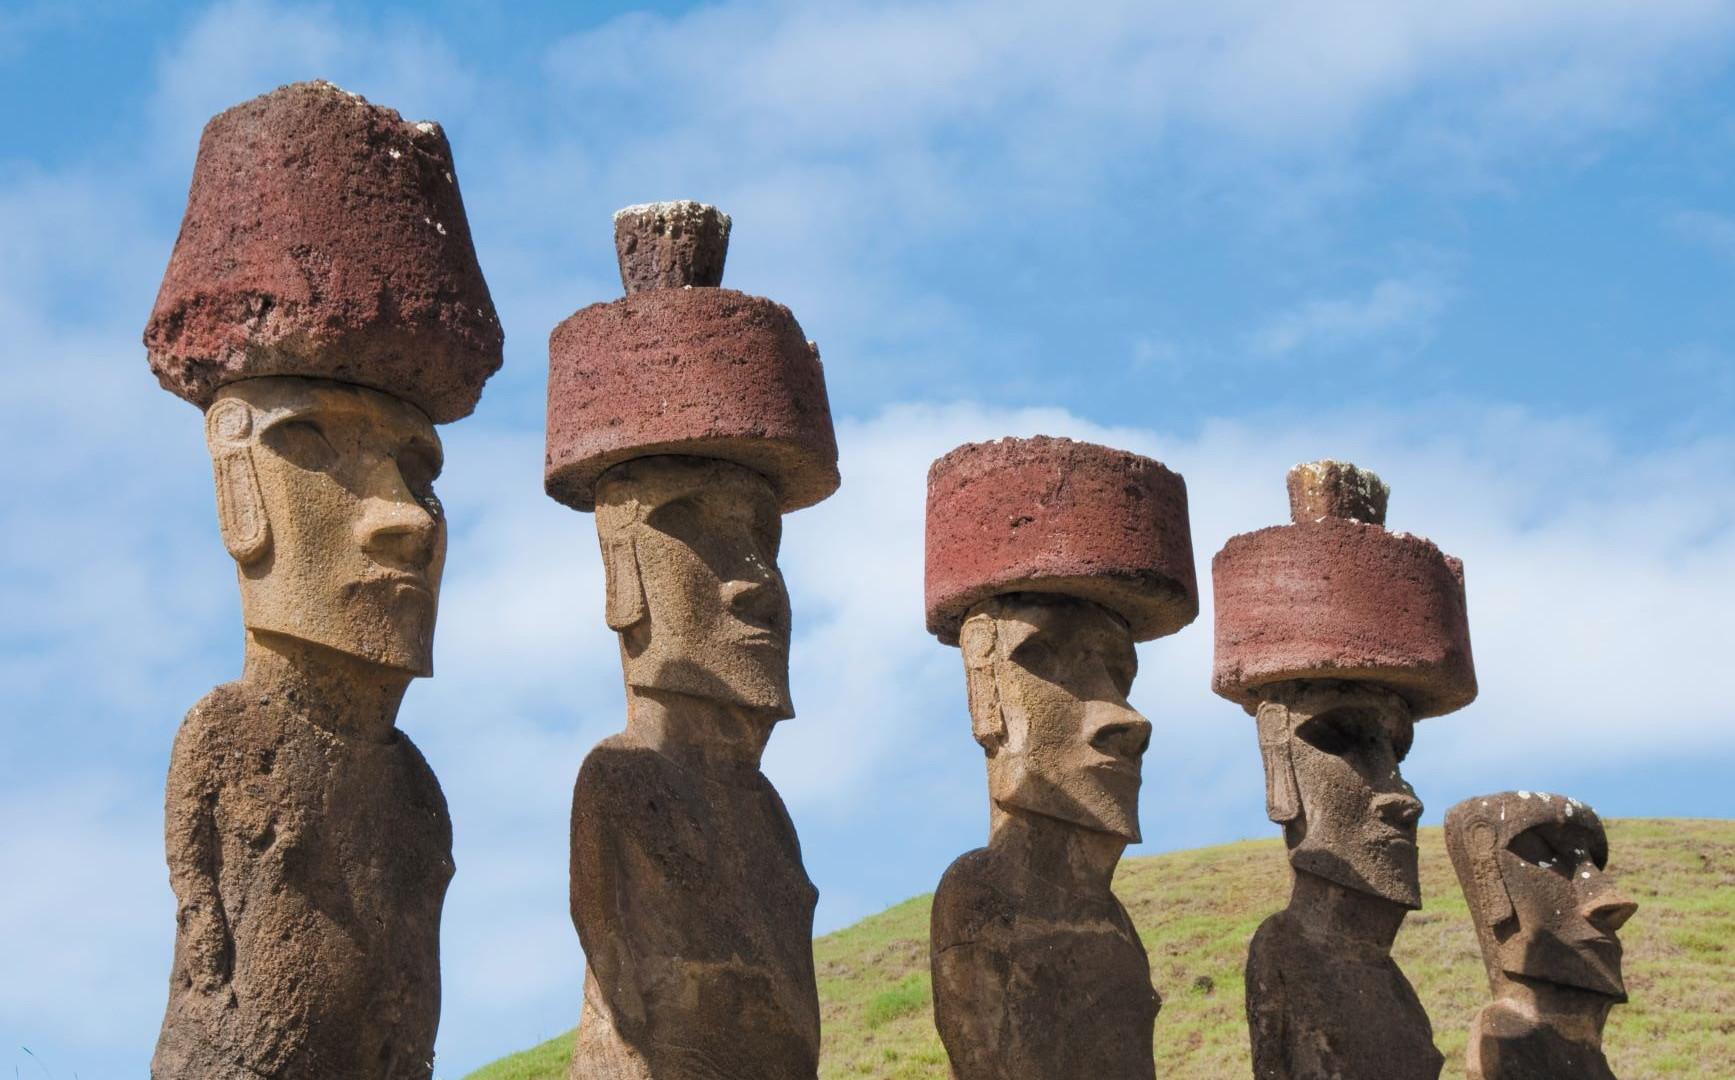 Easter Island - Moai Statues